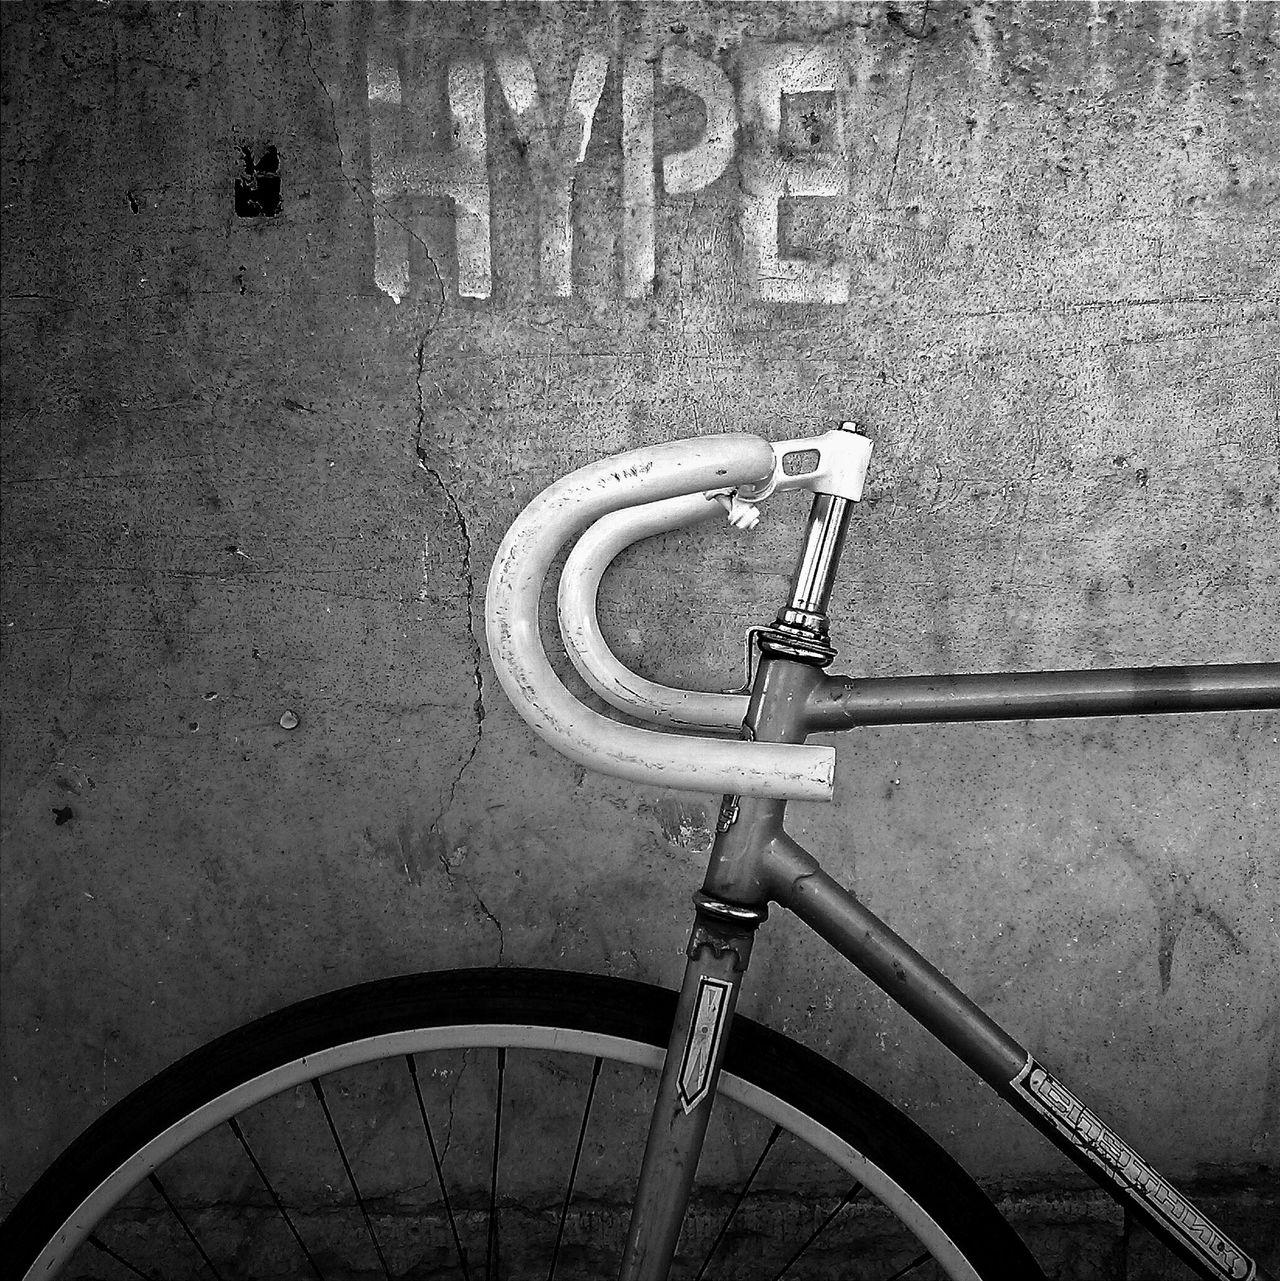 Bff Cycling Riding Bike Spb